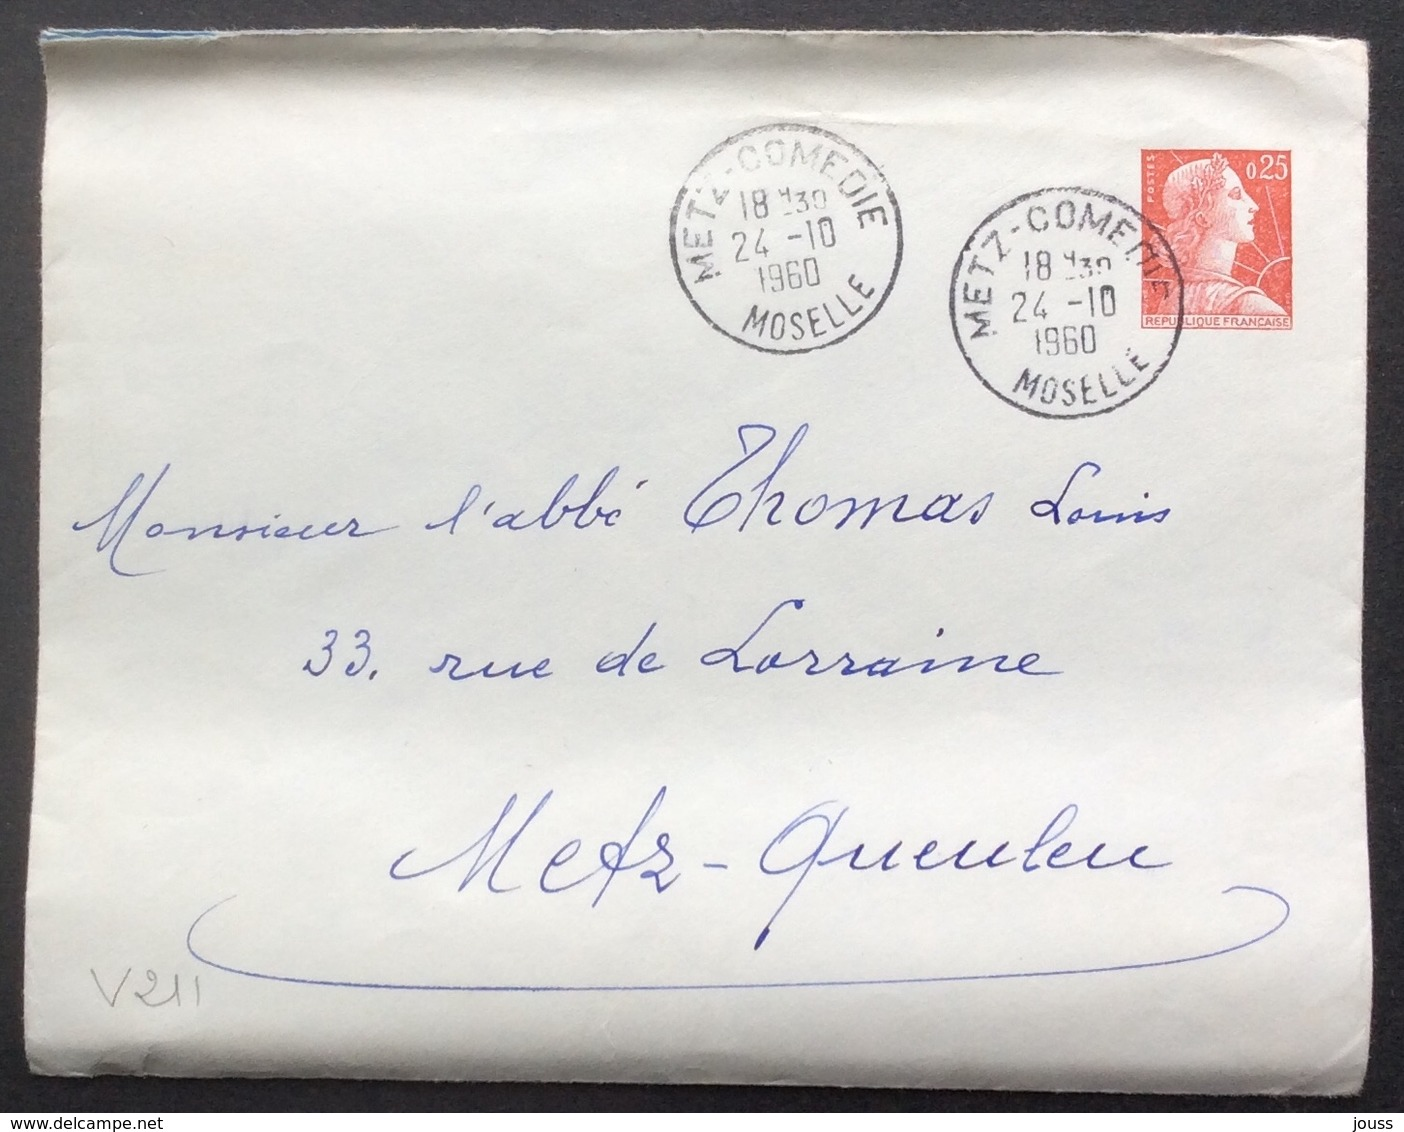 V211 0,25 Marianne Muller Metz-Comédie Moselle 24/10/1960 - Entiers Postaux